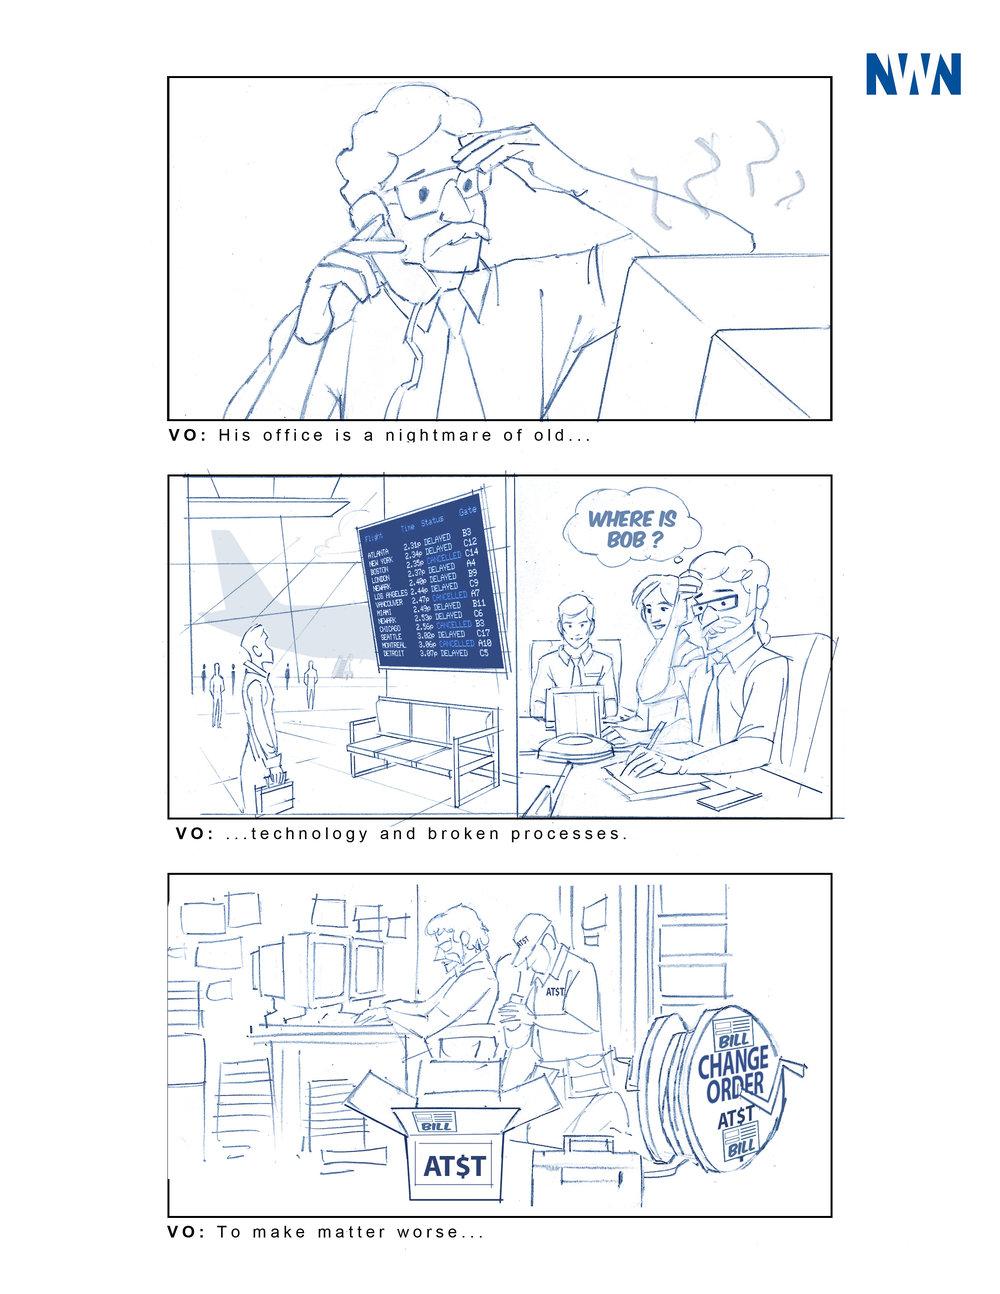 NWN_storyboards_page04.jpg